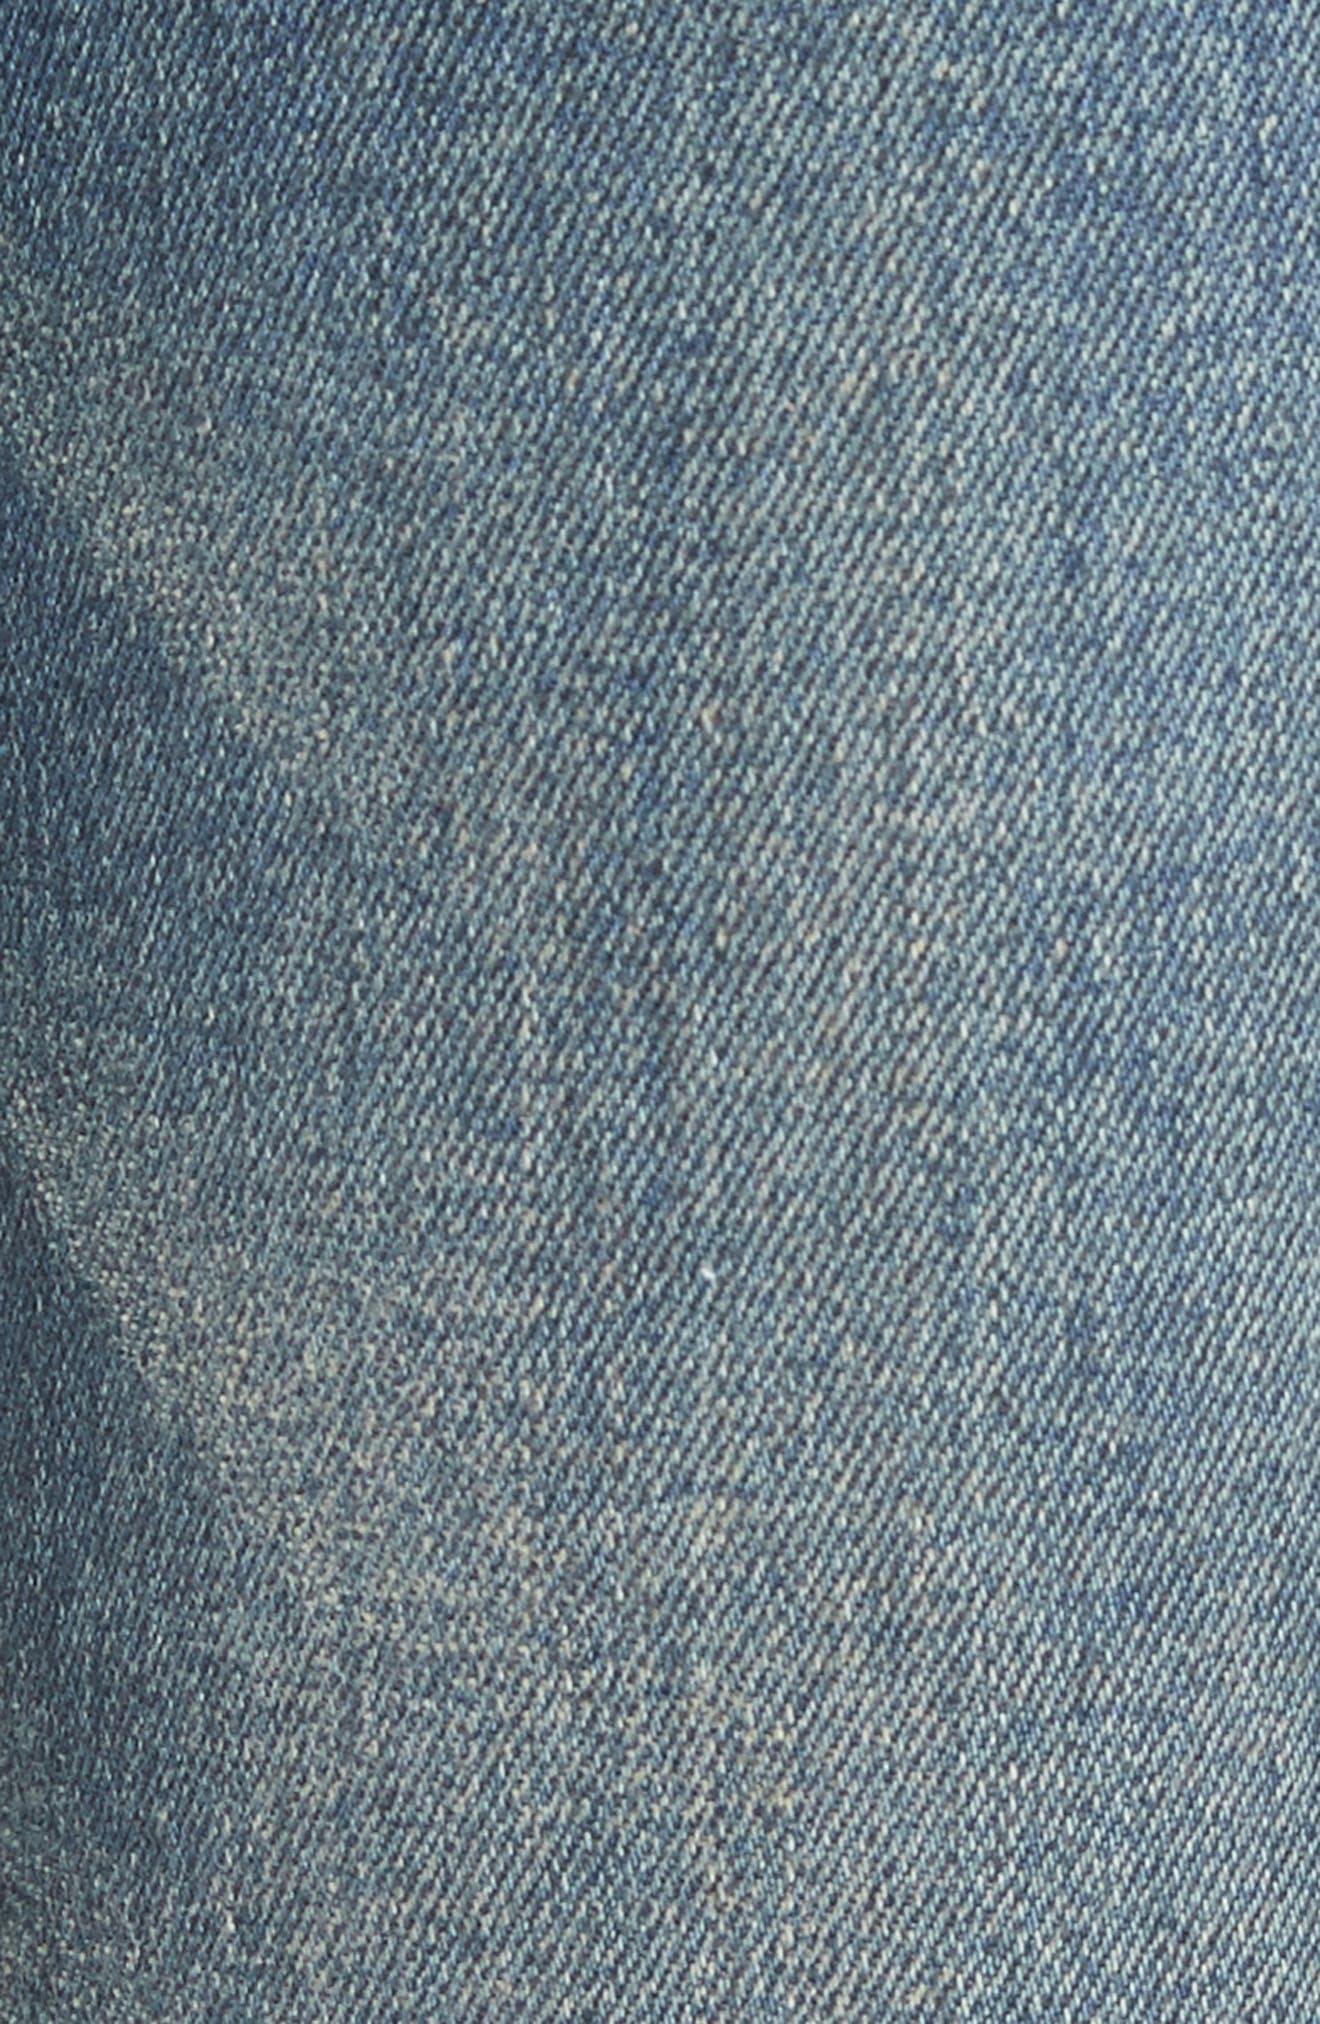 Studded Pocket Skinny Jeans,                             Alternate thumbnail 5, color,